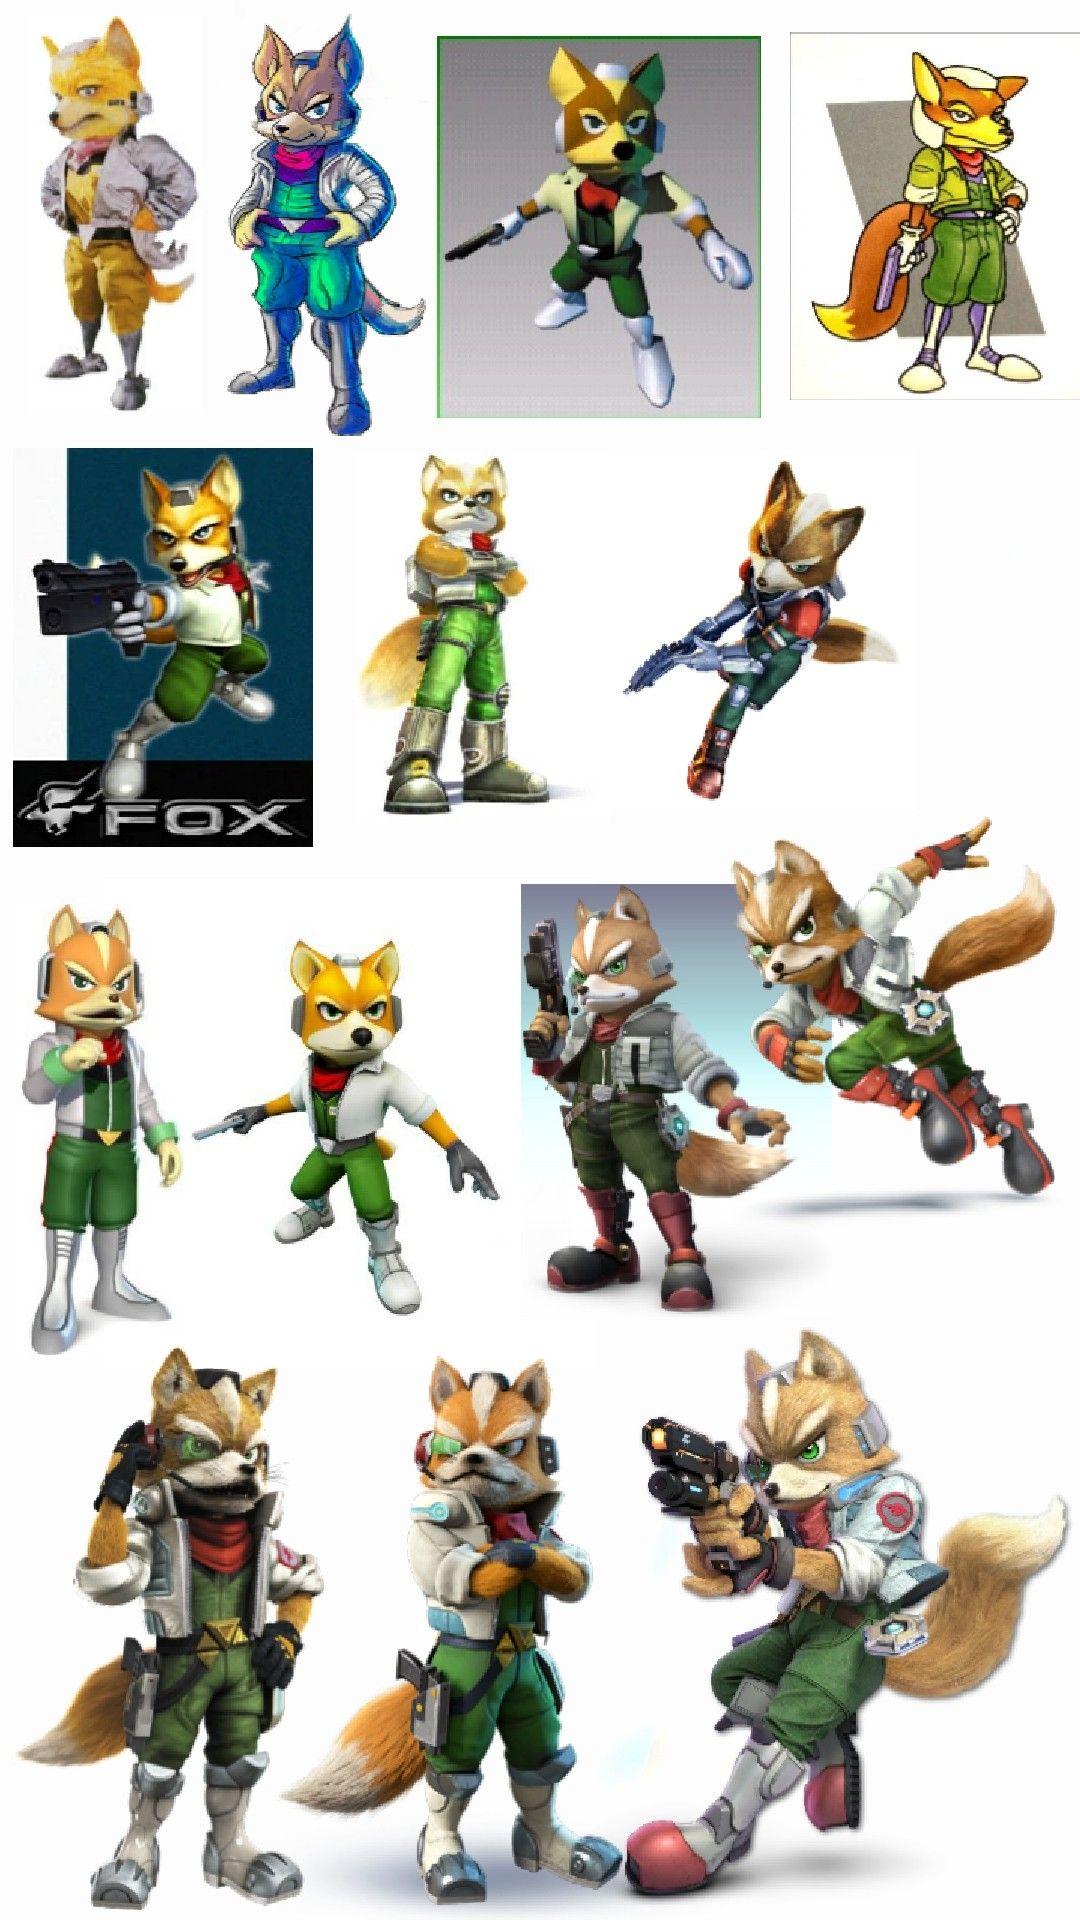 Fox McCloud evolution   Super smash bros   Star fox, Fox